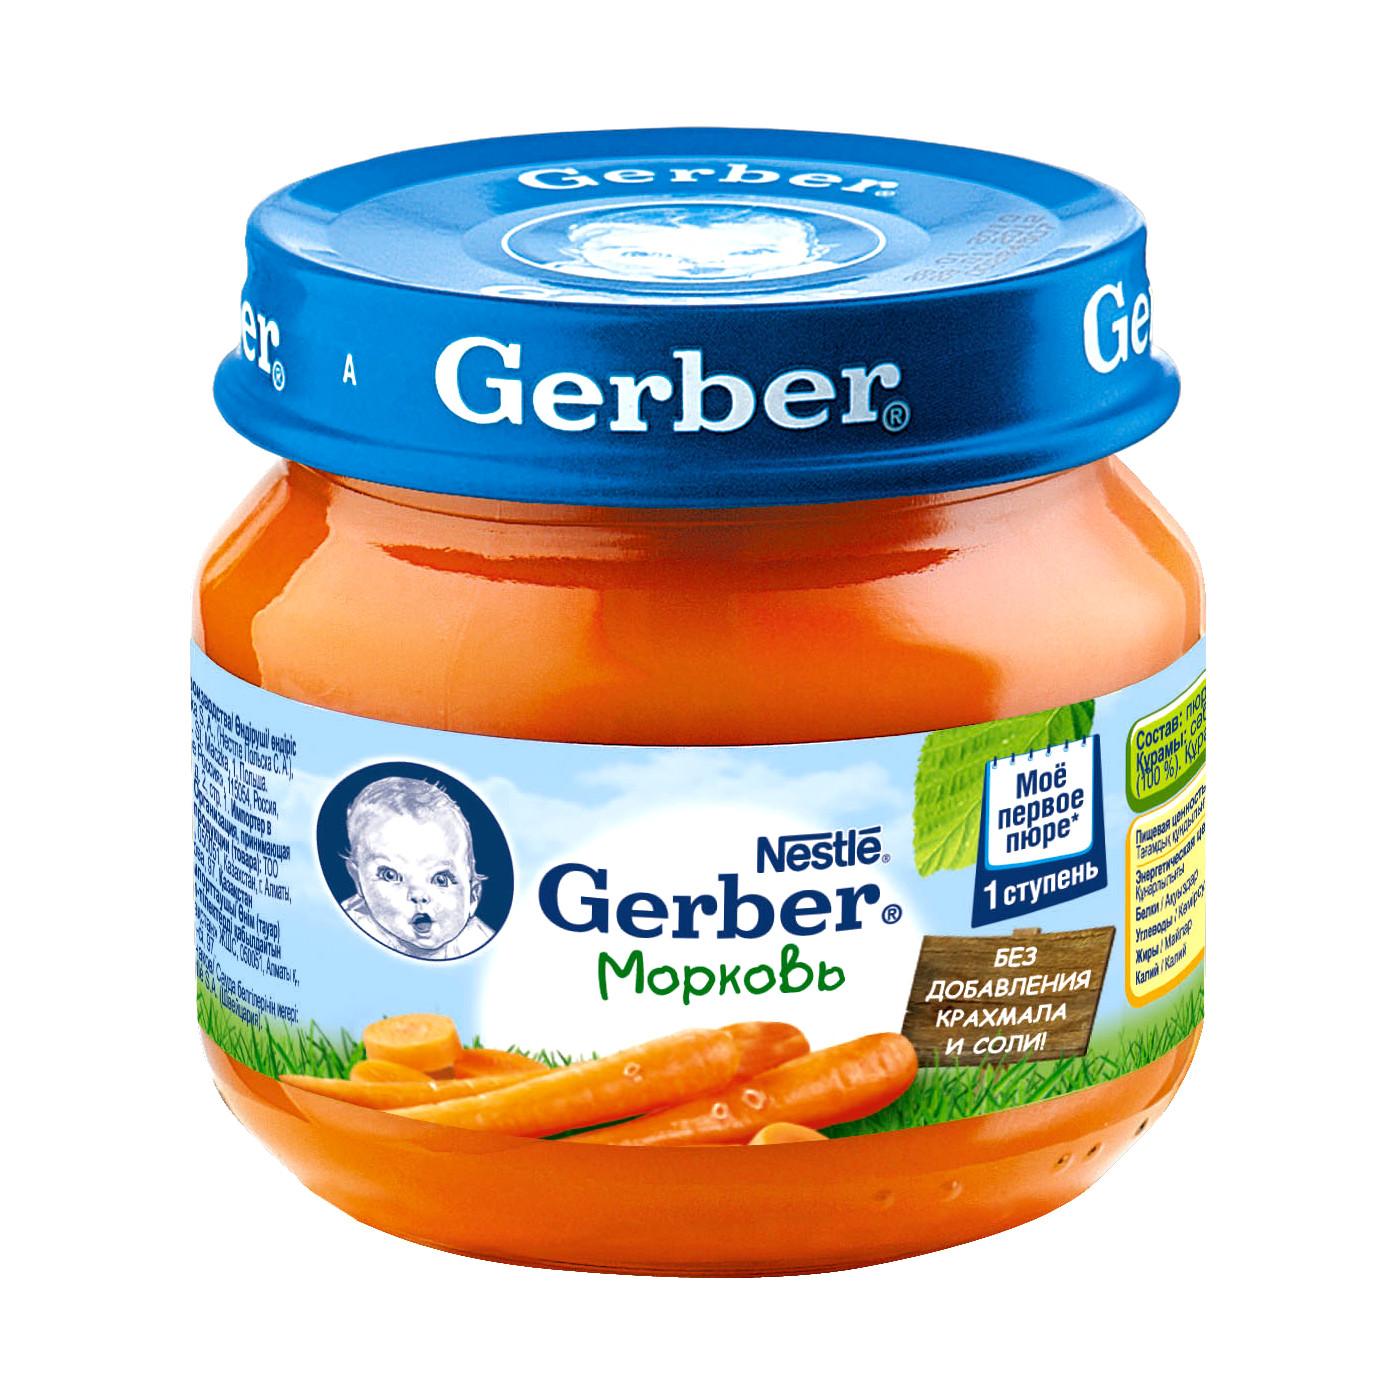 GERBER (США)